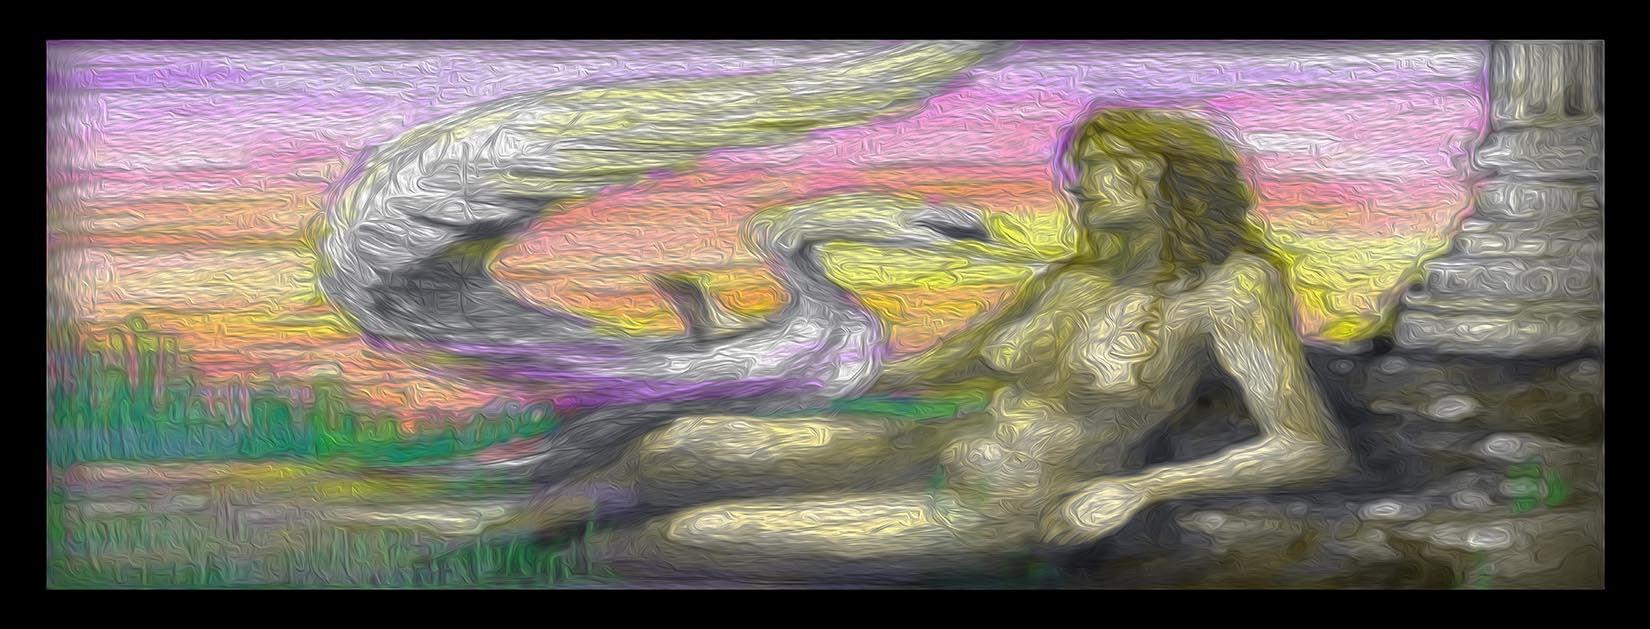 LEDA & THE SWAN: Artwork for La Belle Hélène